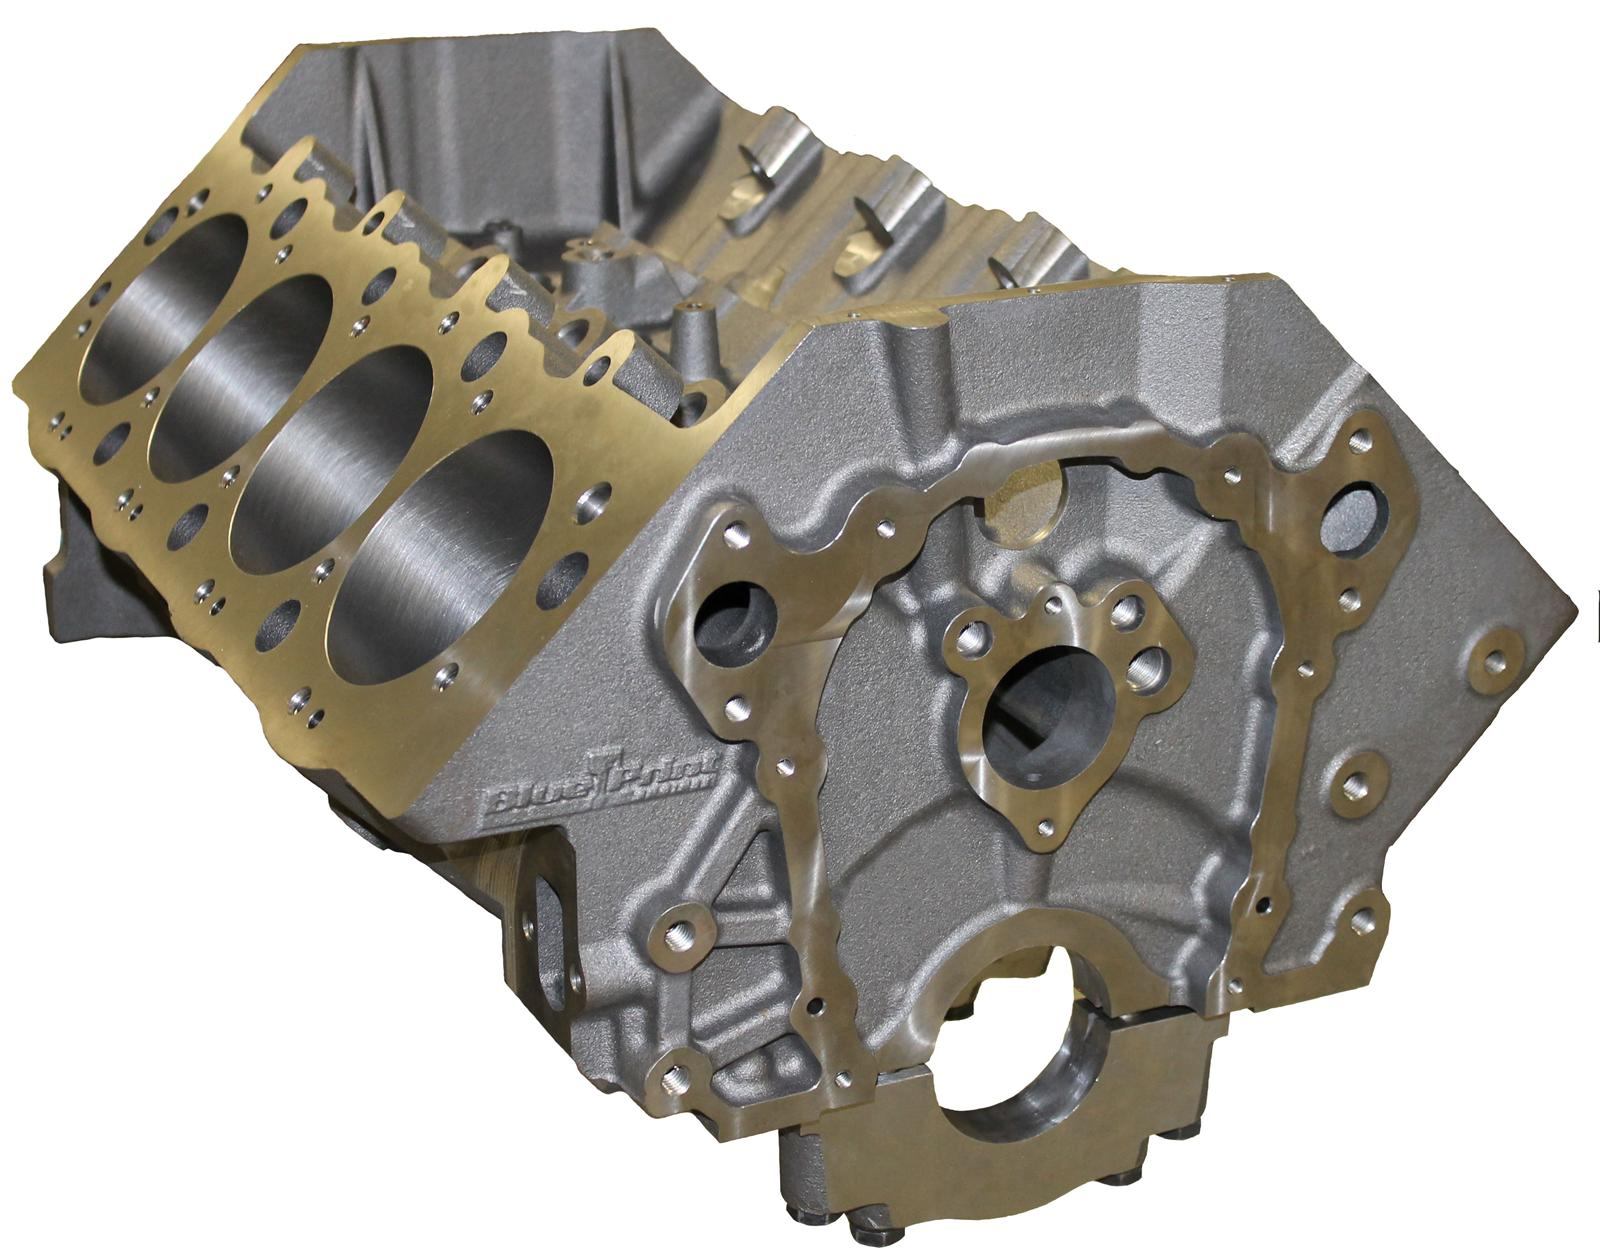 Blueprint engines chevrolet 454 engine block bpt4500100s ebay blueprint engines chevrolet 454 engine block bpt4500100s malvernweather Images